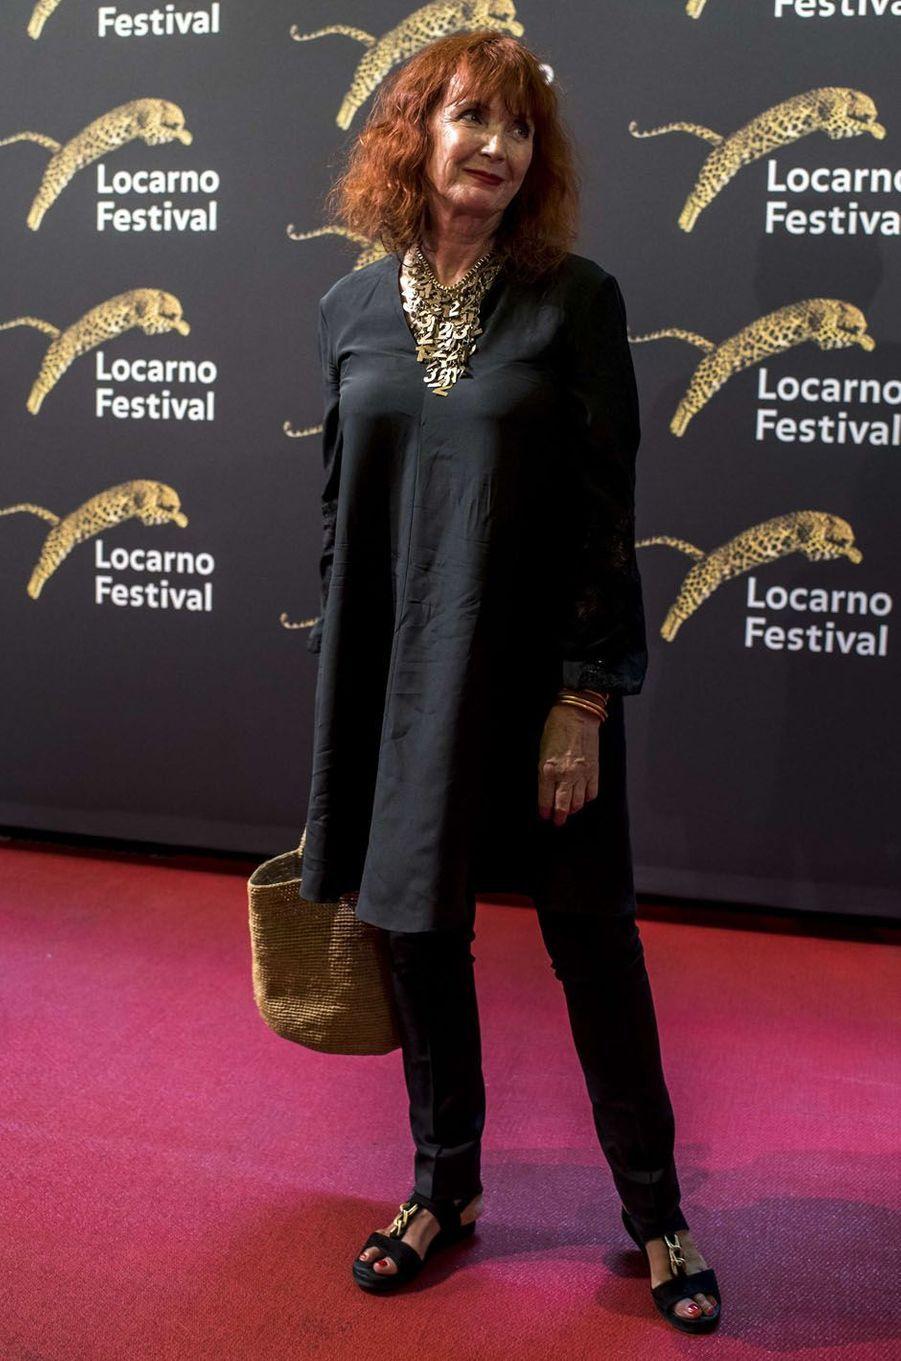 Sabine Azémaau festival de Loncarno, le 2 août 2017.